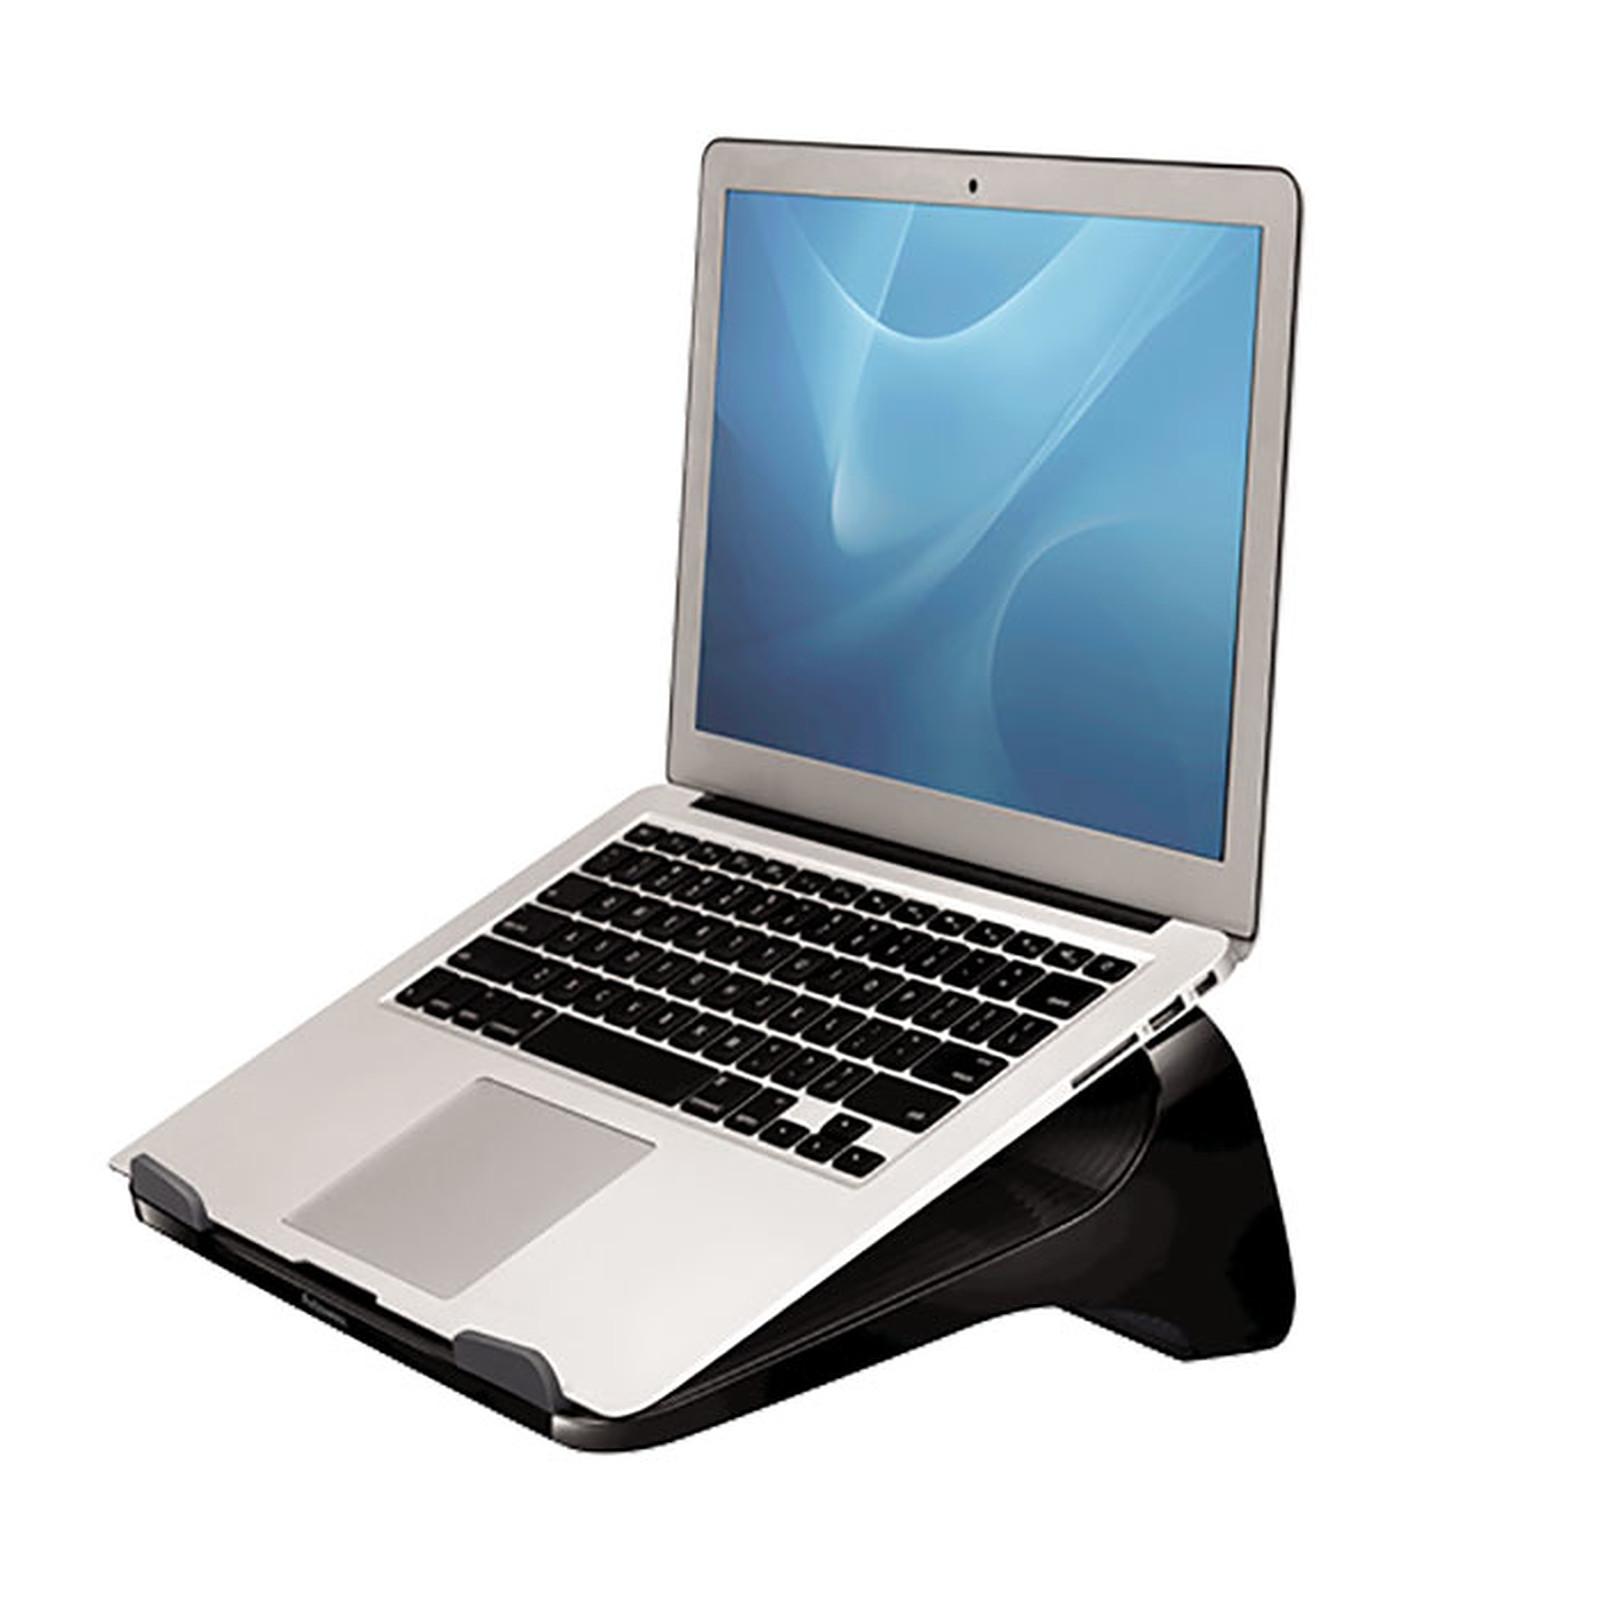 Fellowes Support pour ordinateur portable I-Spire Series